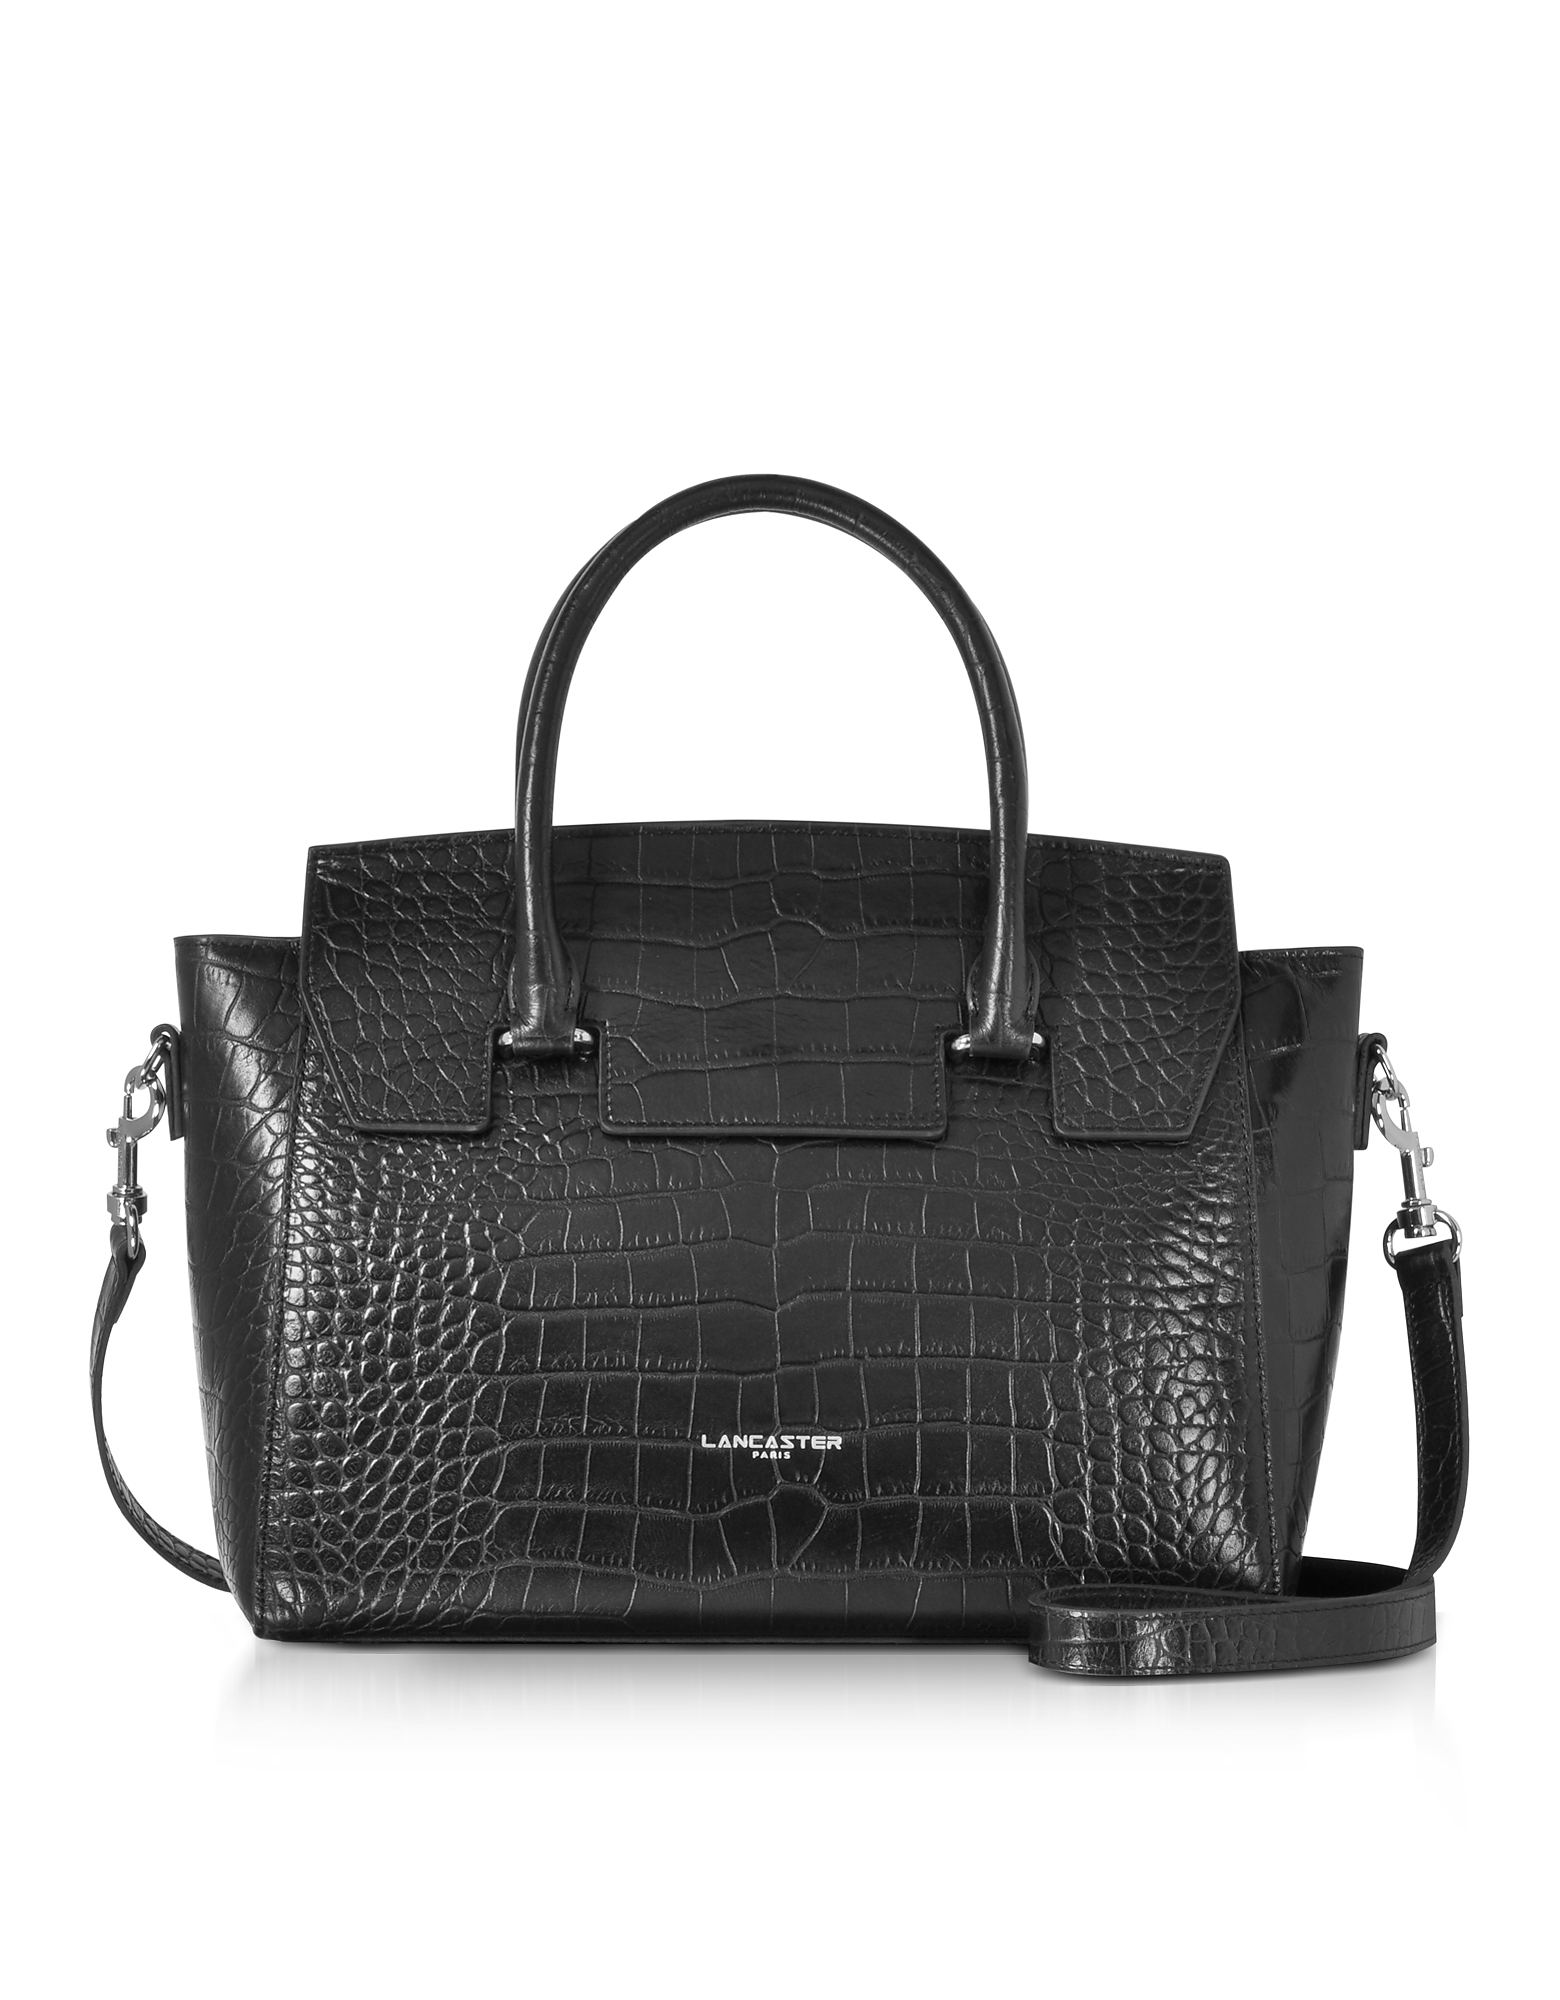 Lancaster Paris Handbags, Black Croco Embossed Leather Satchel Bag